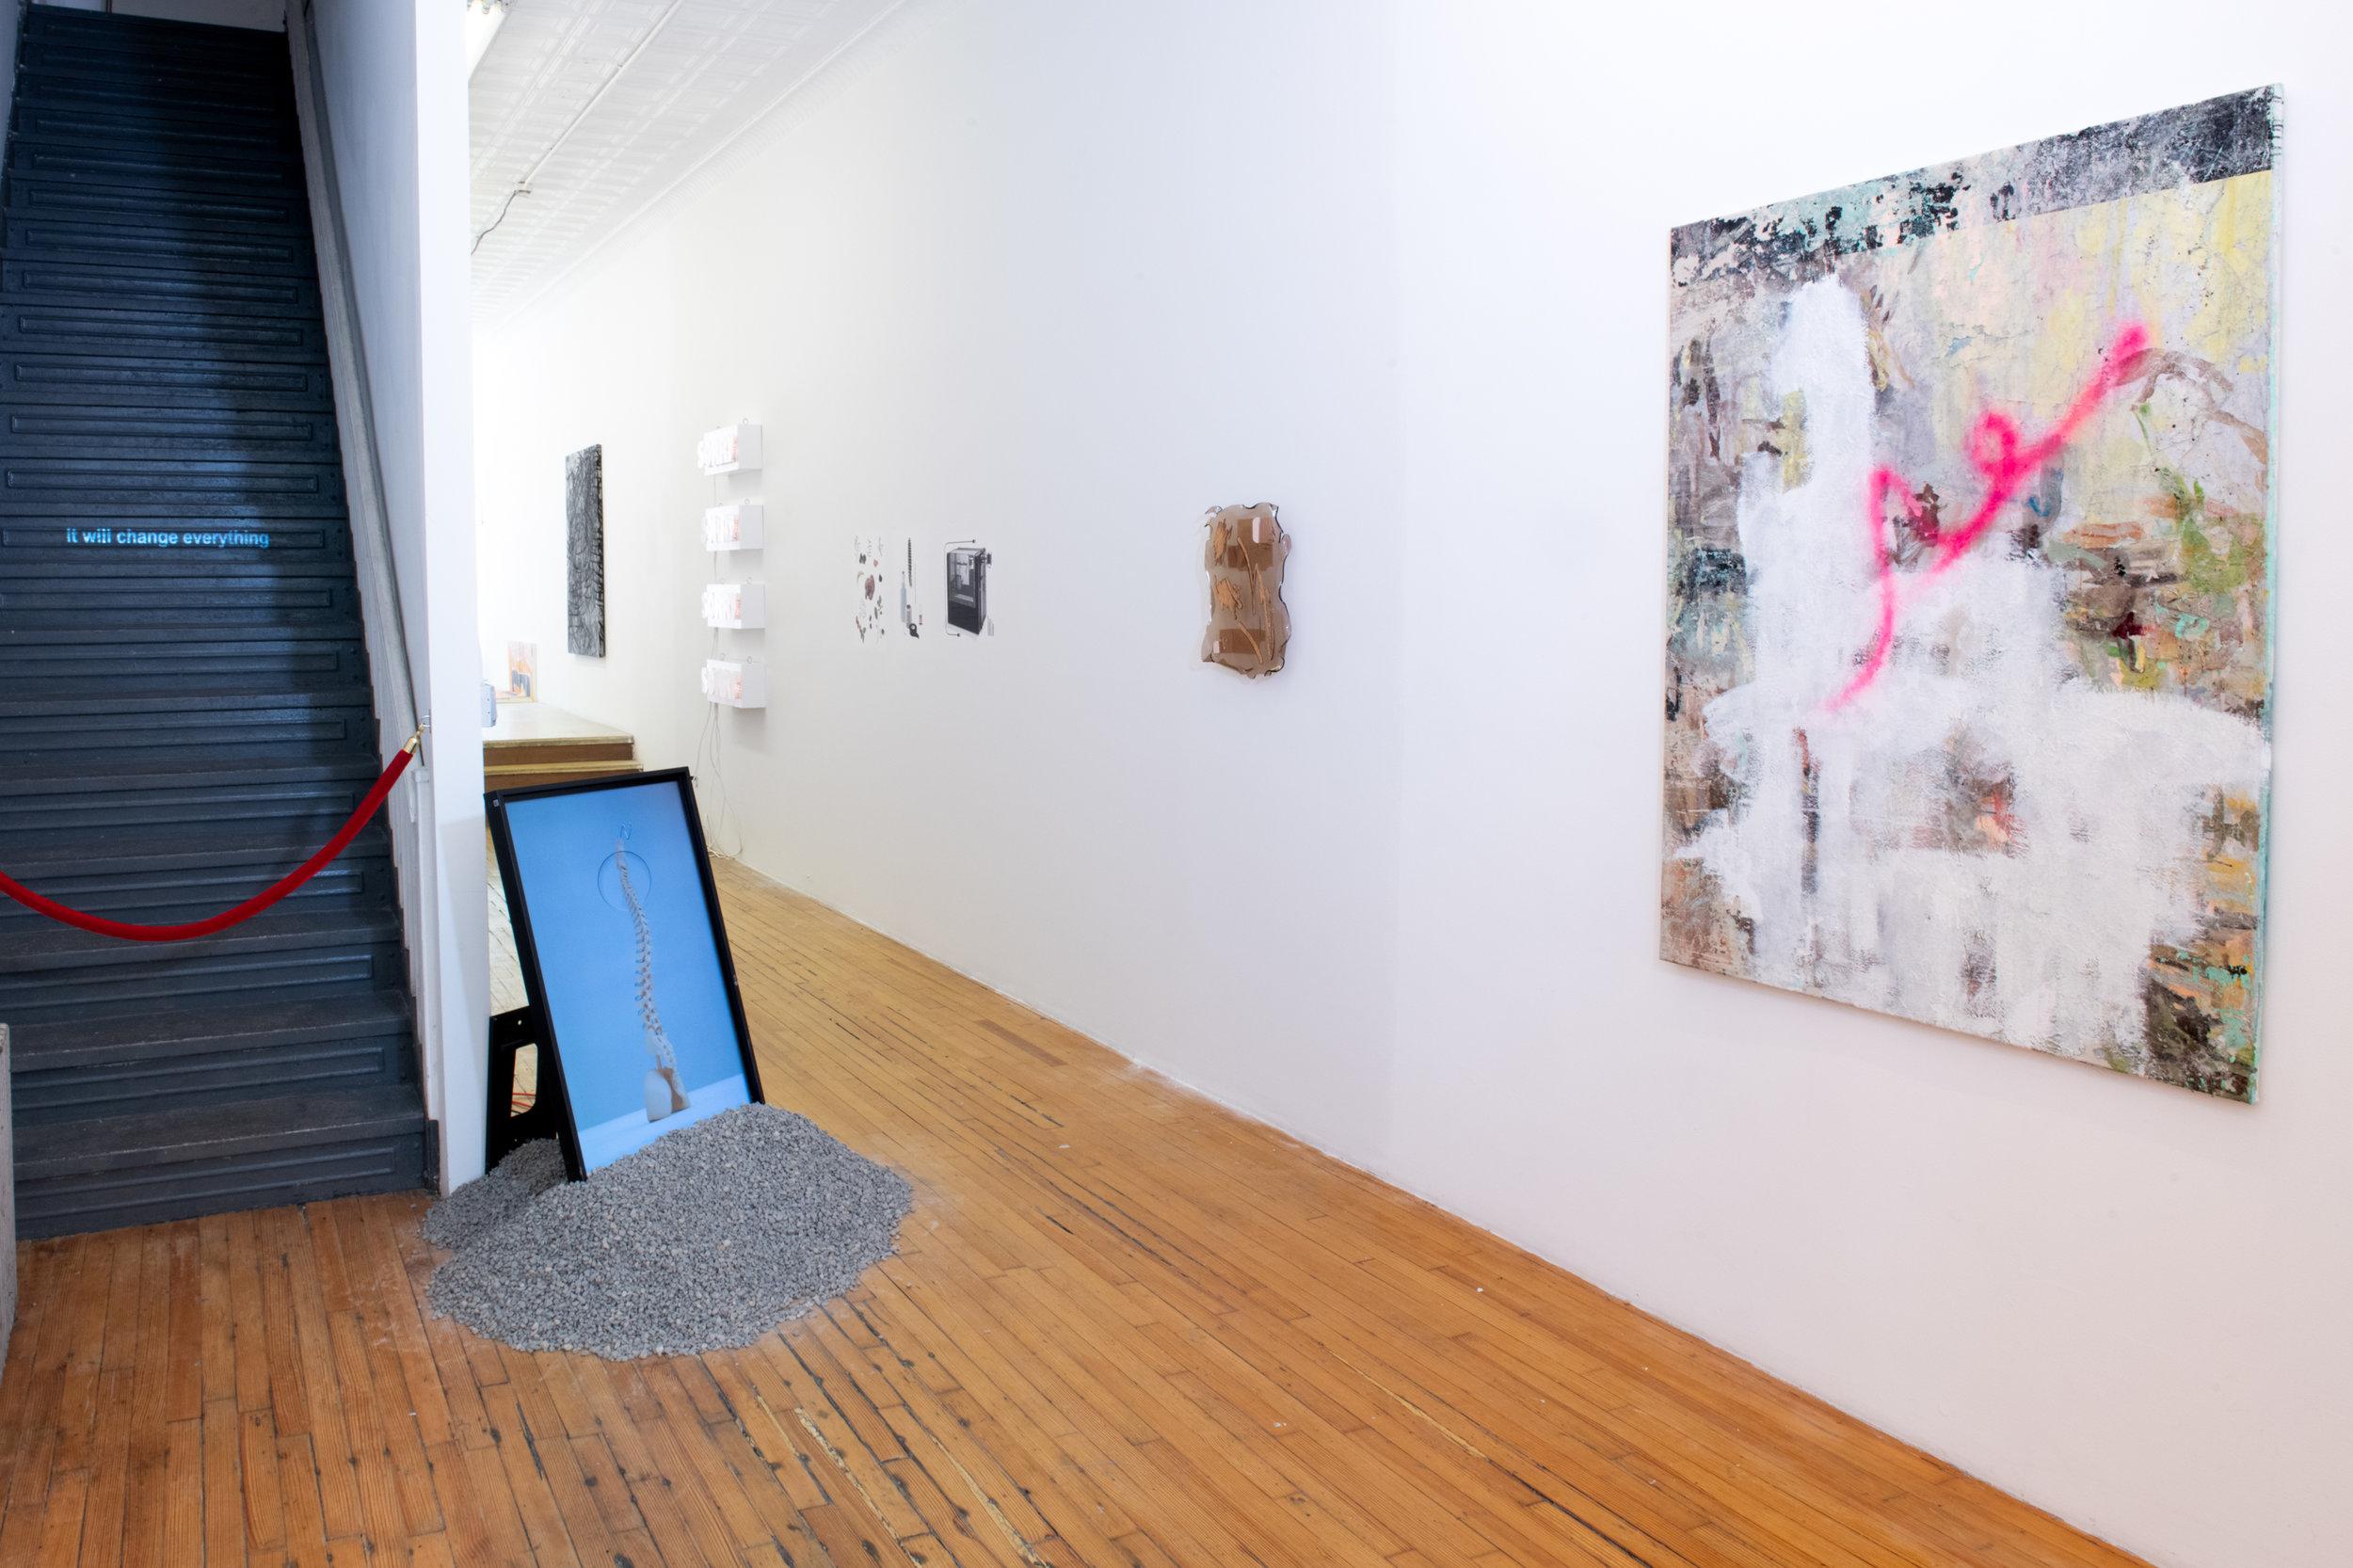 Here + Now Installation view at Pablo's Birthday Focus: Stine Deja, Liz Naiden, Jenni Brosinski, Hannah Sophie Dunkelberg, and Joshua Citarella Photograph by - Edoardo Cozzani